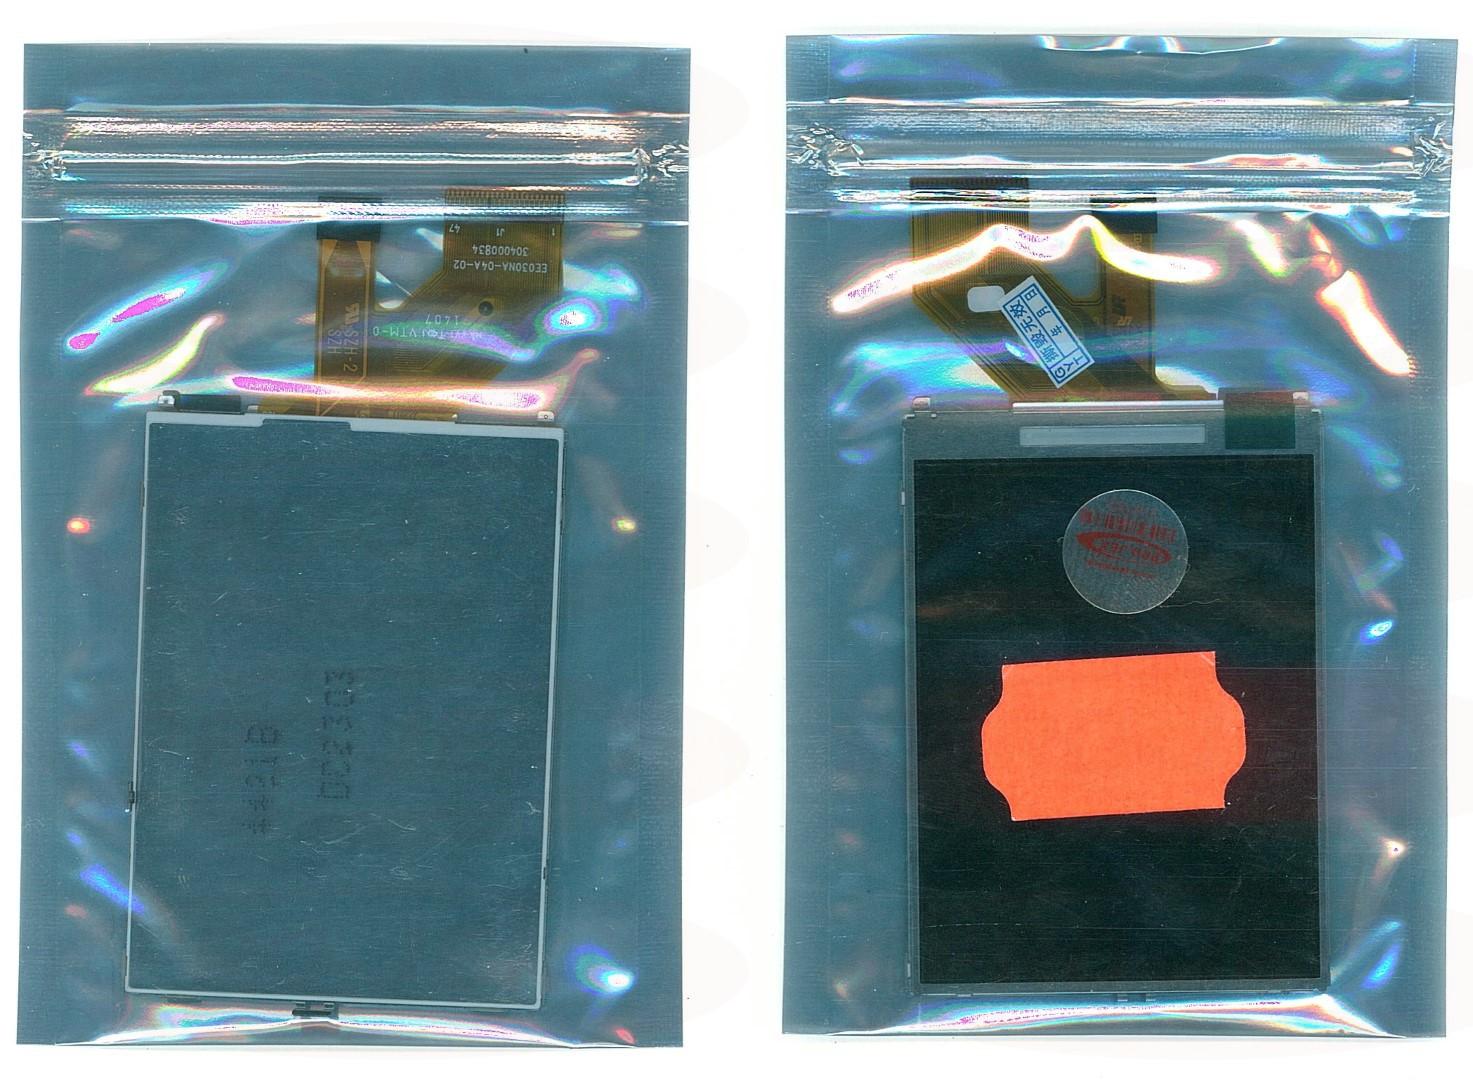 Panasonic DMC-TZ35 DMC-ZS25 + backlight wyświetlacz LCD